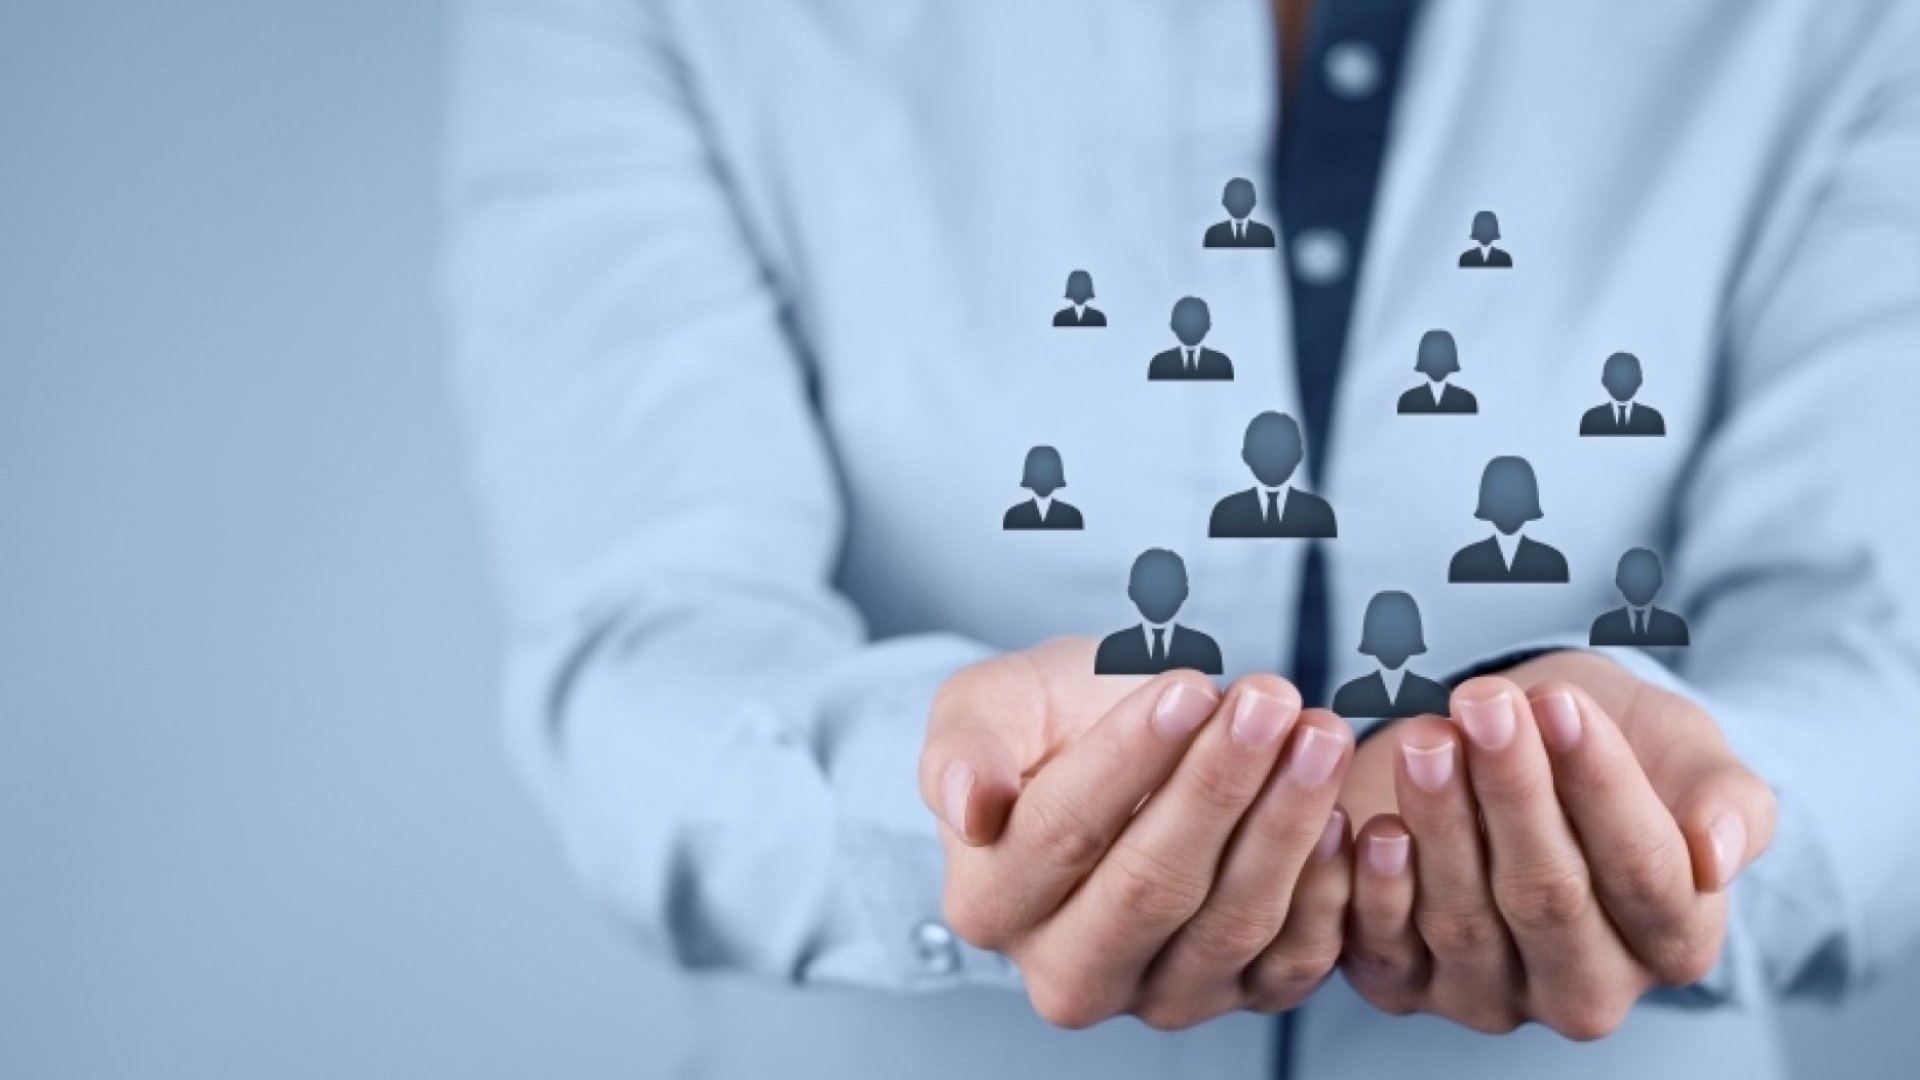 <p>Το πελατολόγιο της εταιρίας περιλαμβάνει ένα μεγάλο αριθμό ιδιωτικών επιχειρήσεων, αλλά και δημόσιων φορέων. Δείτε περισσότερα</p>